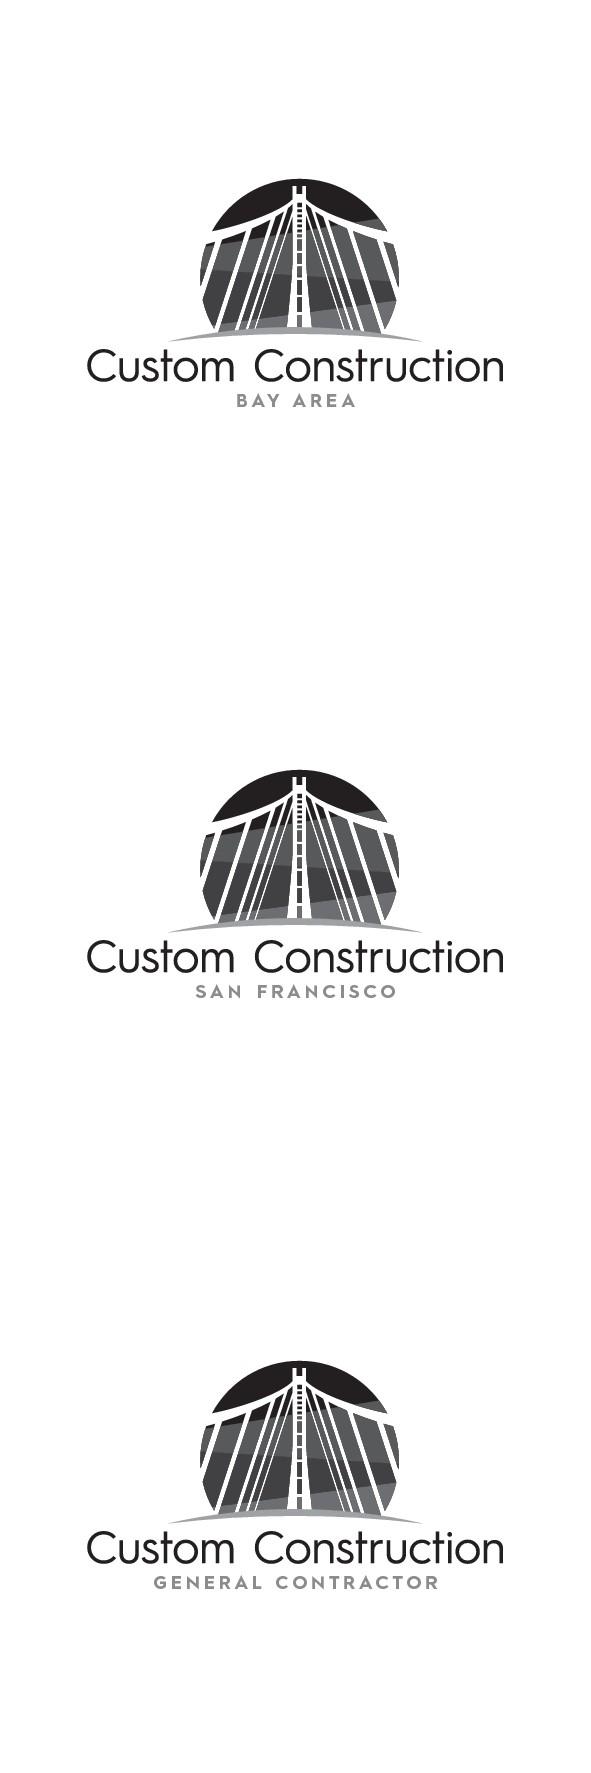 Construction Company Logo Design With Bridge